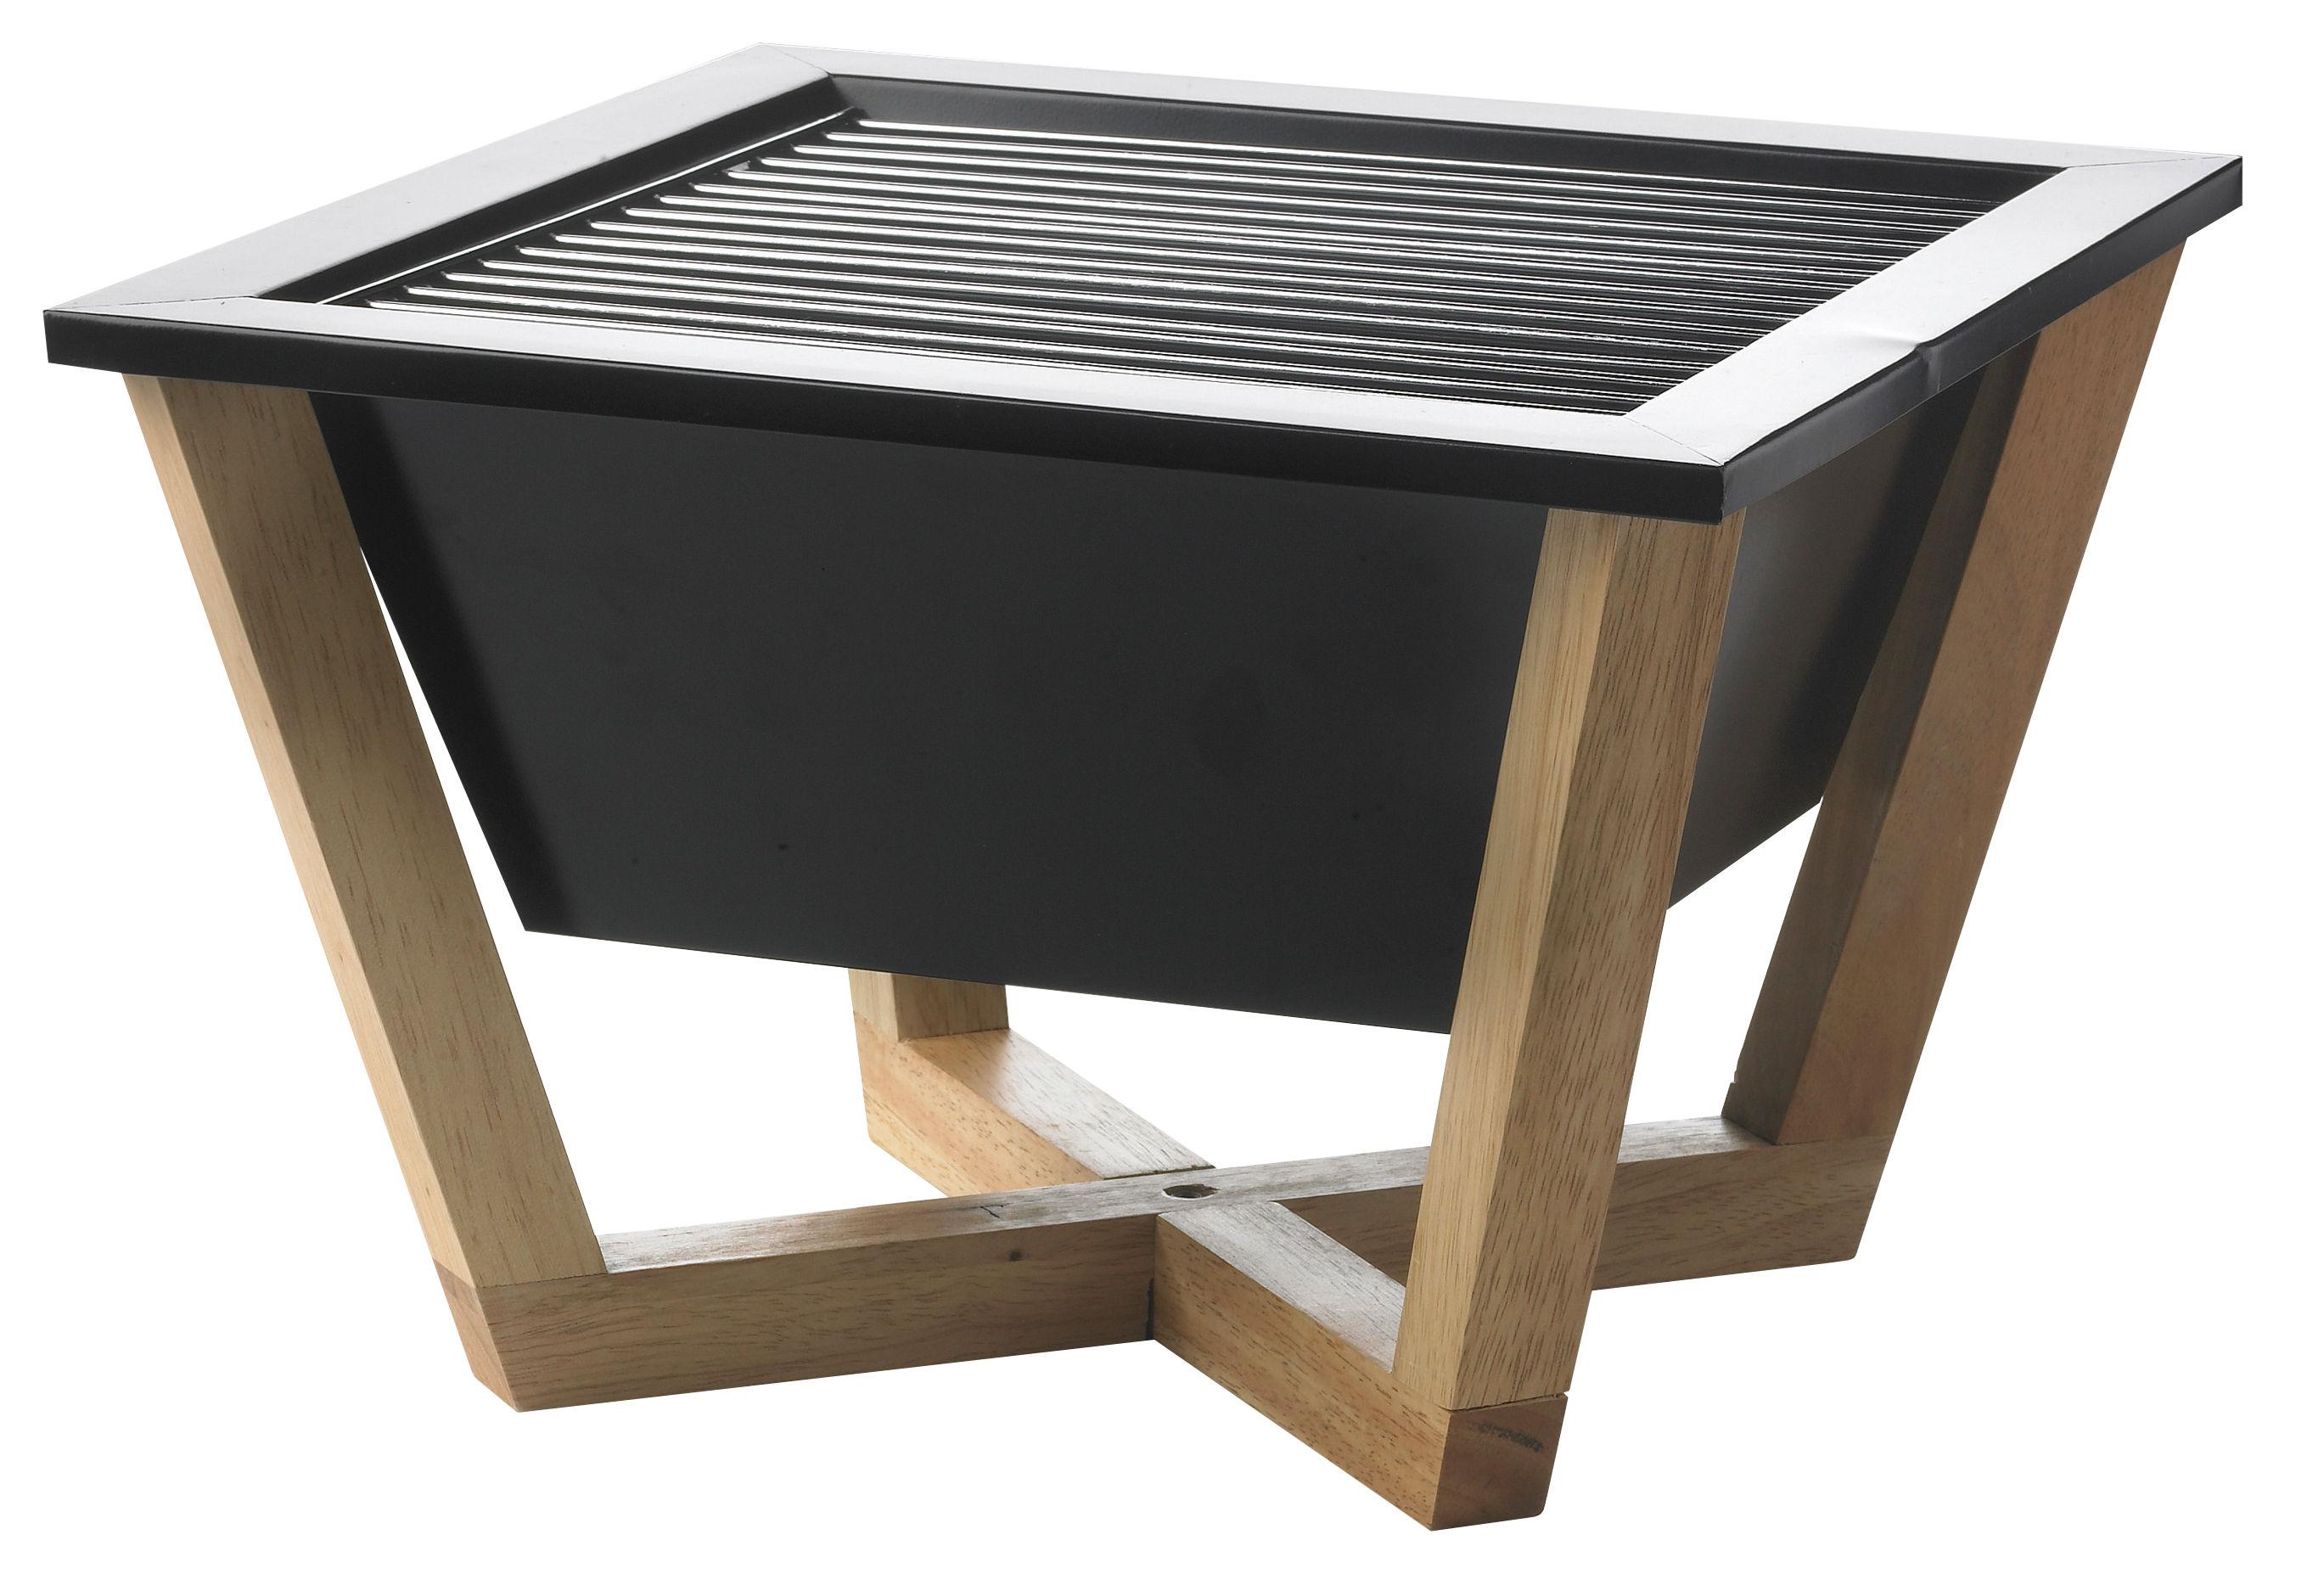 barbecue charbon nido portable 35 x 35 cm noir bois naturel xd design. Black Bedroom Furniture Sets. Home Design Ideas